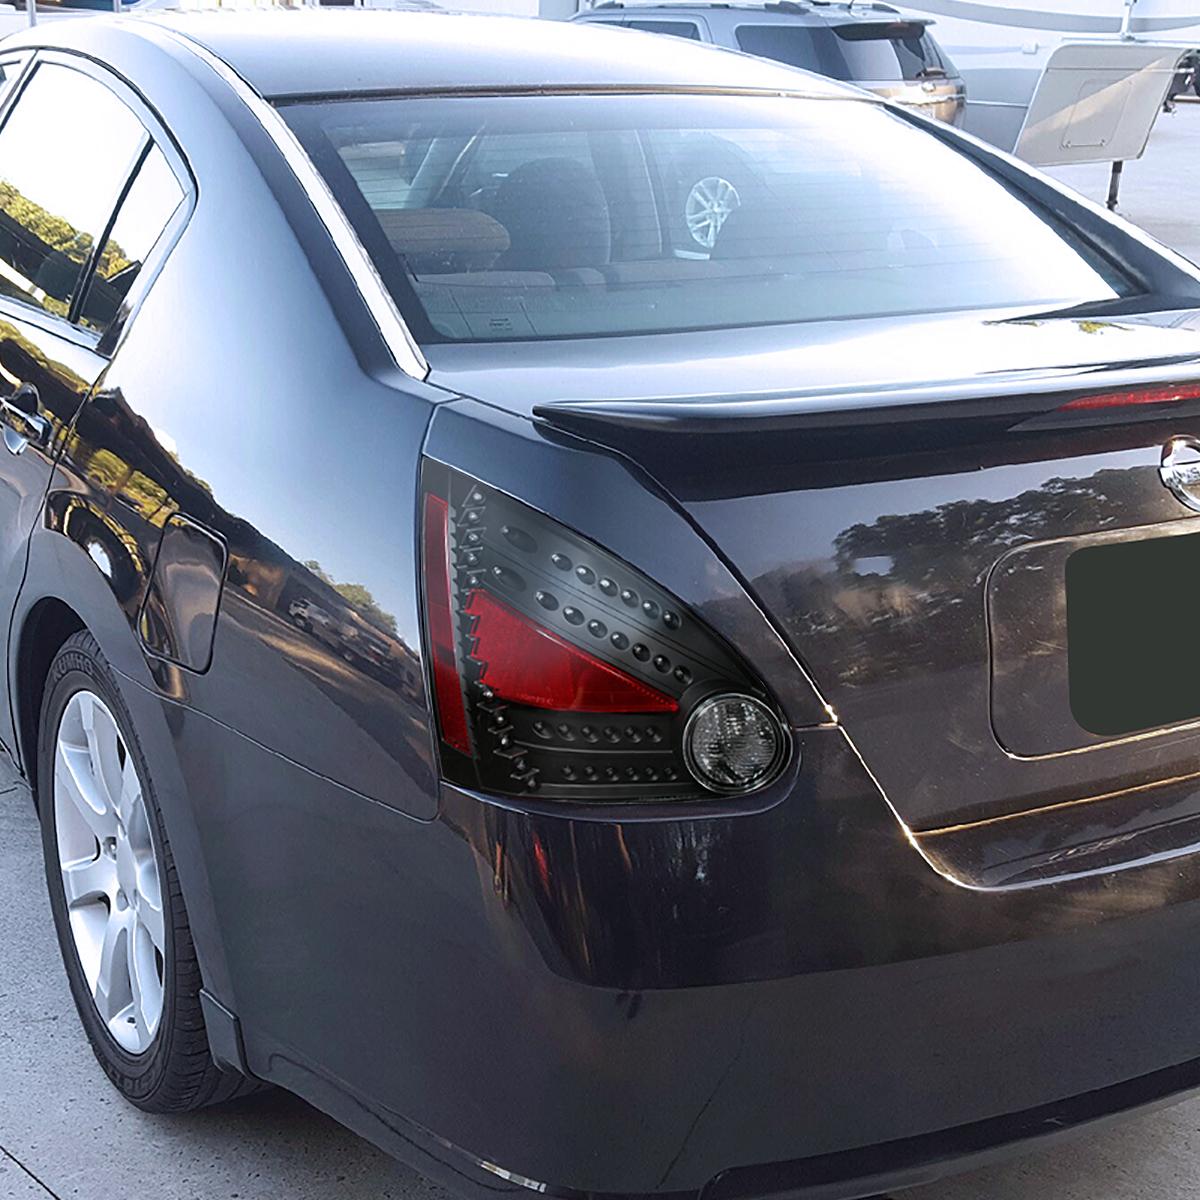 Depo Led Tail Stop Lights Black For 2004 2008 Nissan Maxima Ebay